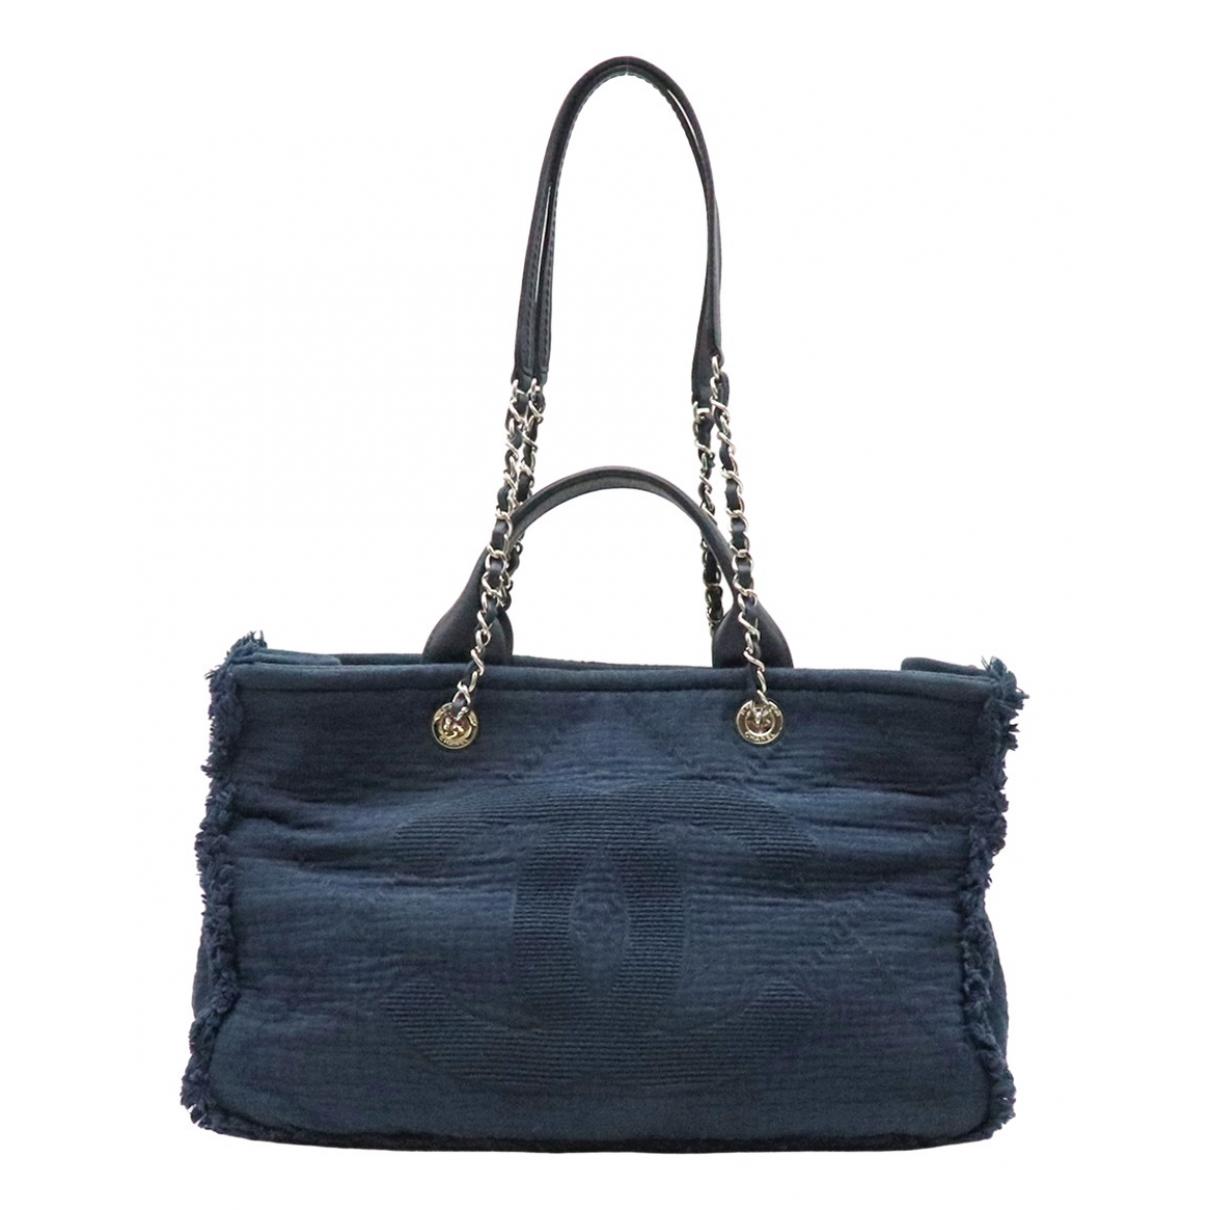 Chanel \N Navy Cotton handbag for Women \N